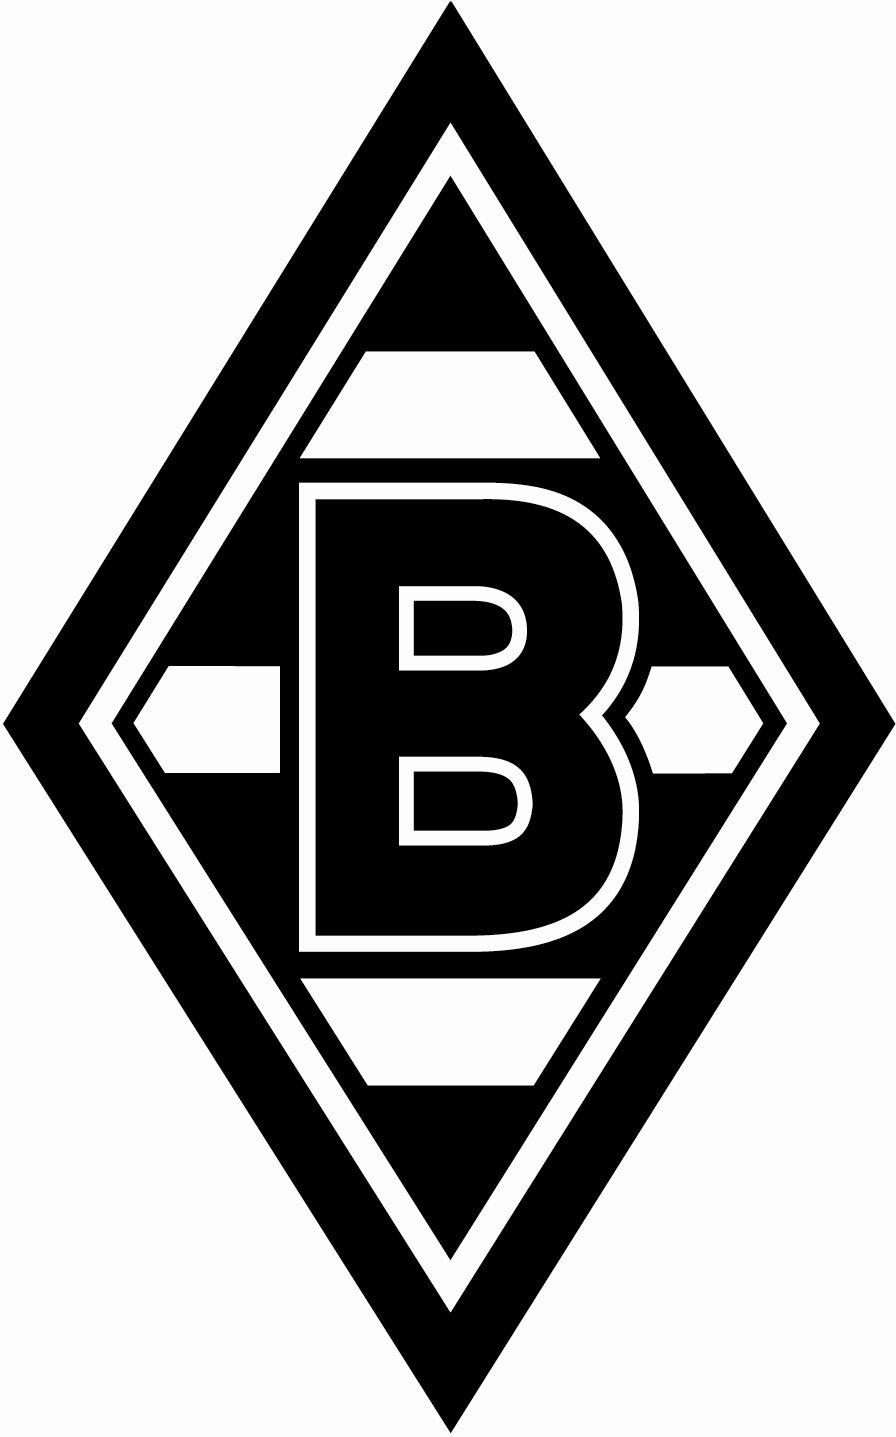 Pin Von Josh Rogers Auf Bundesliga Campeonato Alemao Borussia Monchengladbach Vfl Borussia Monchengladbach Bundesliga Logo